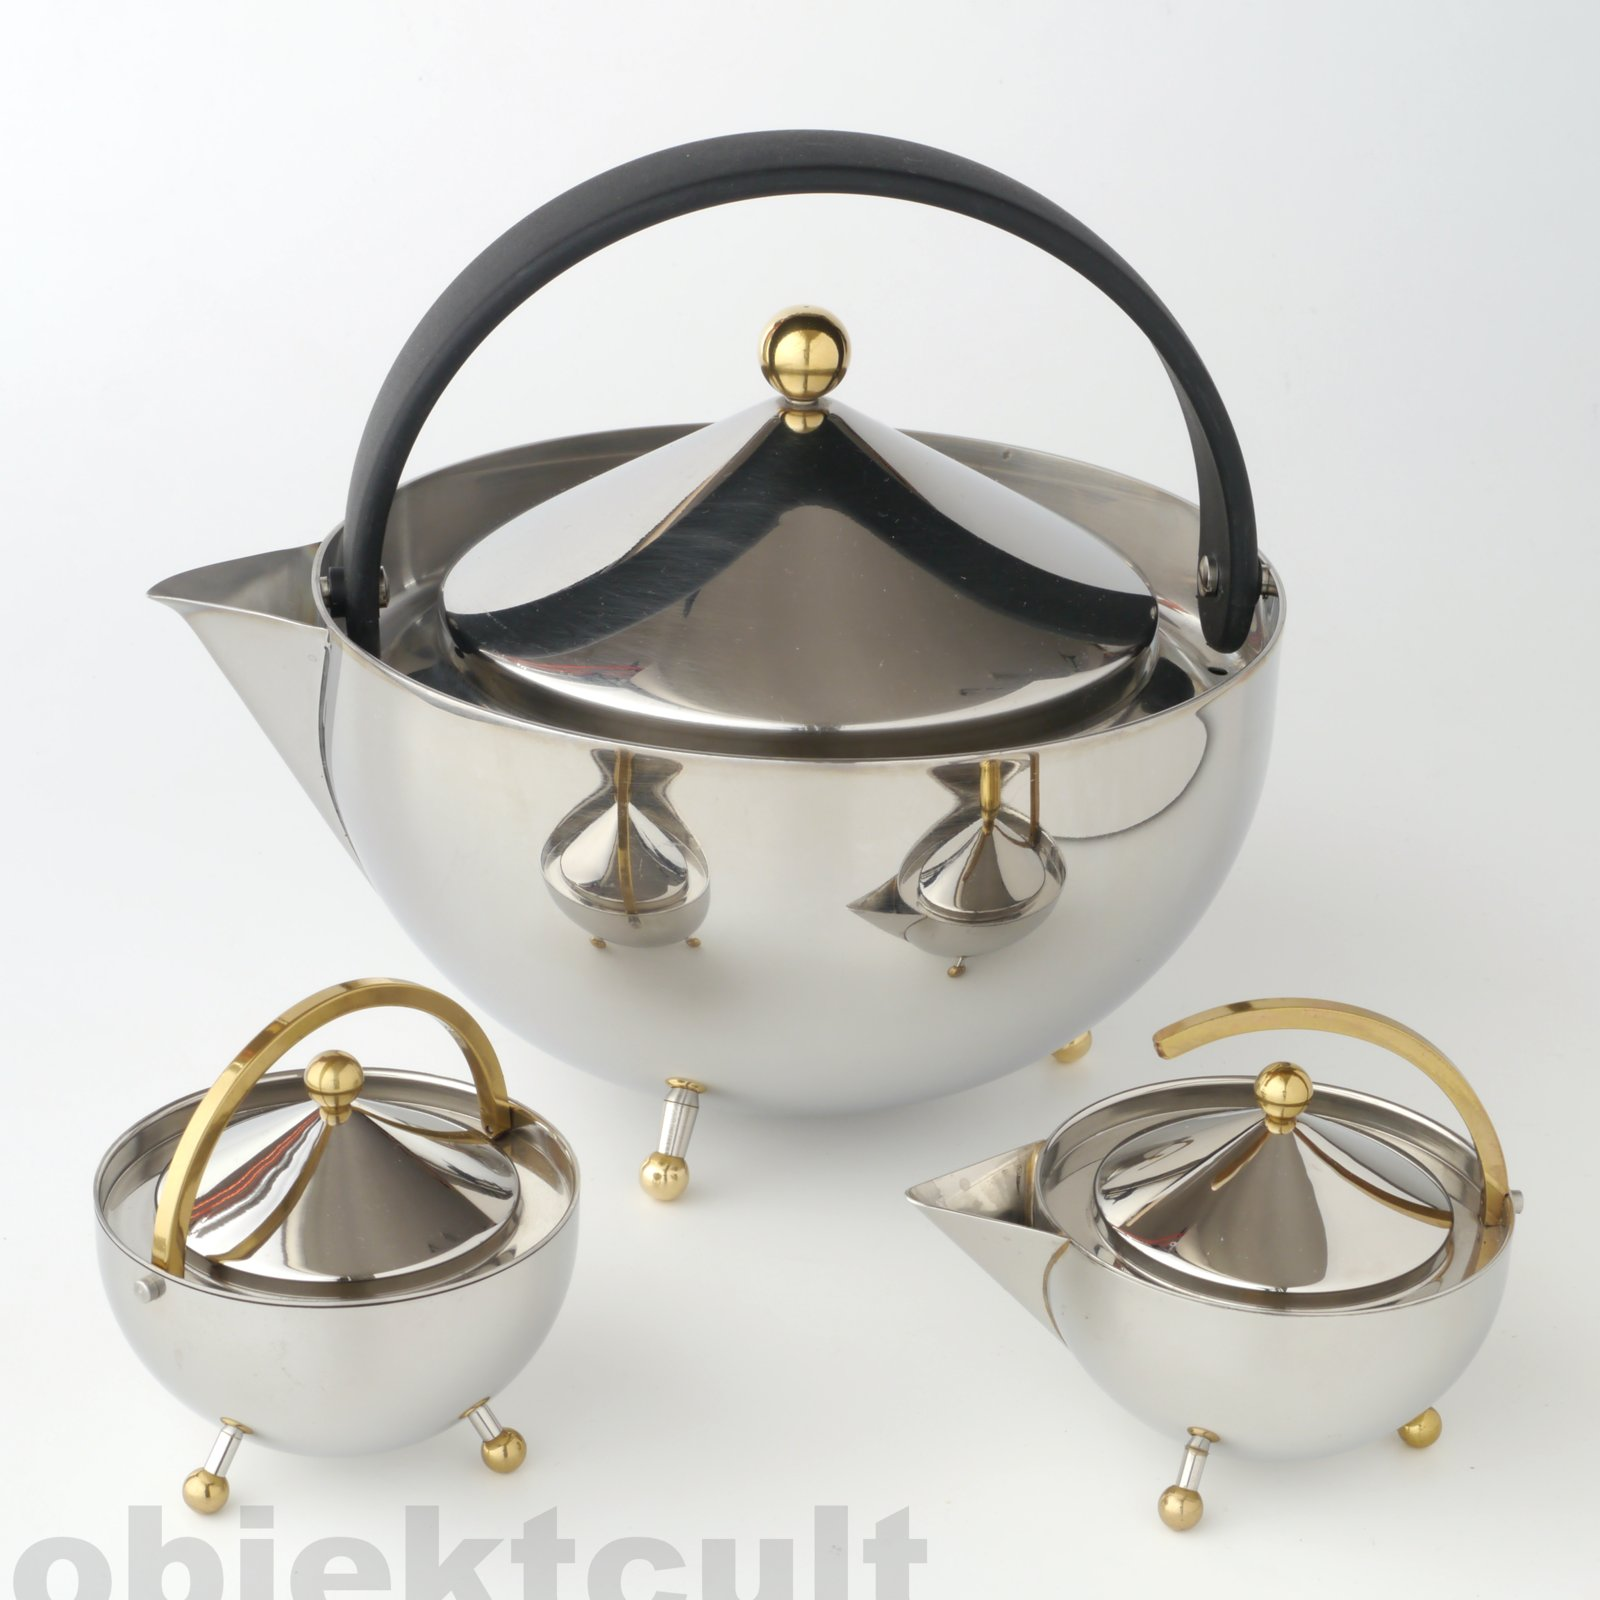 postmodern 80s design bodum teabowl teapot milk sugar inox teekanne memphis ebay. Black Bedroom Furniture Sets. Home Design Ideas